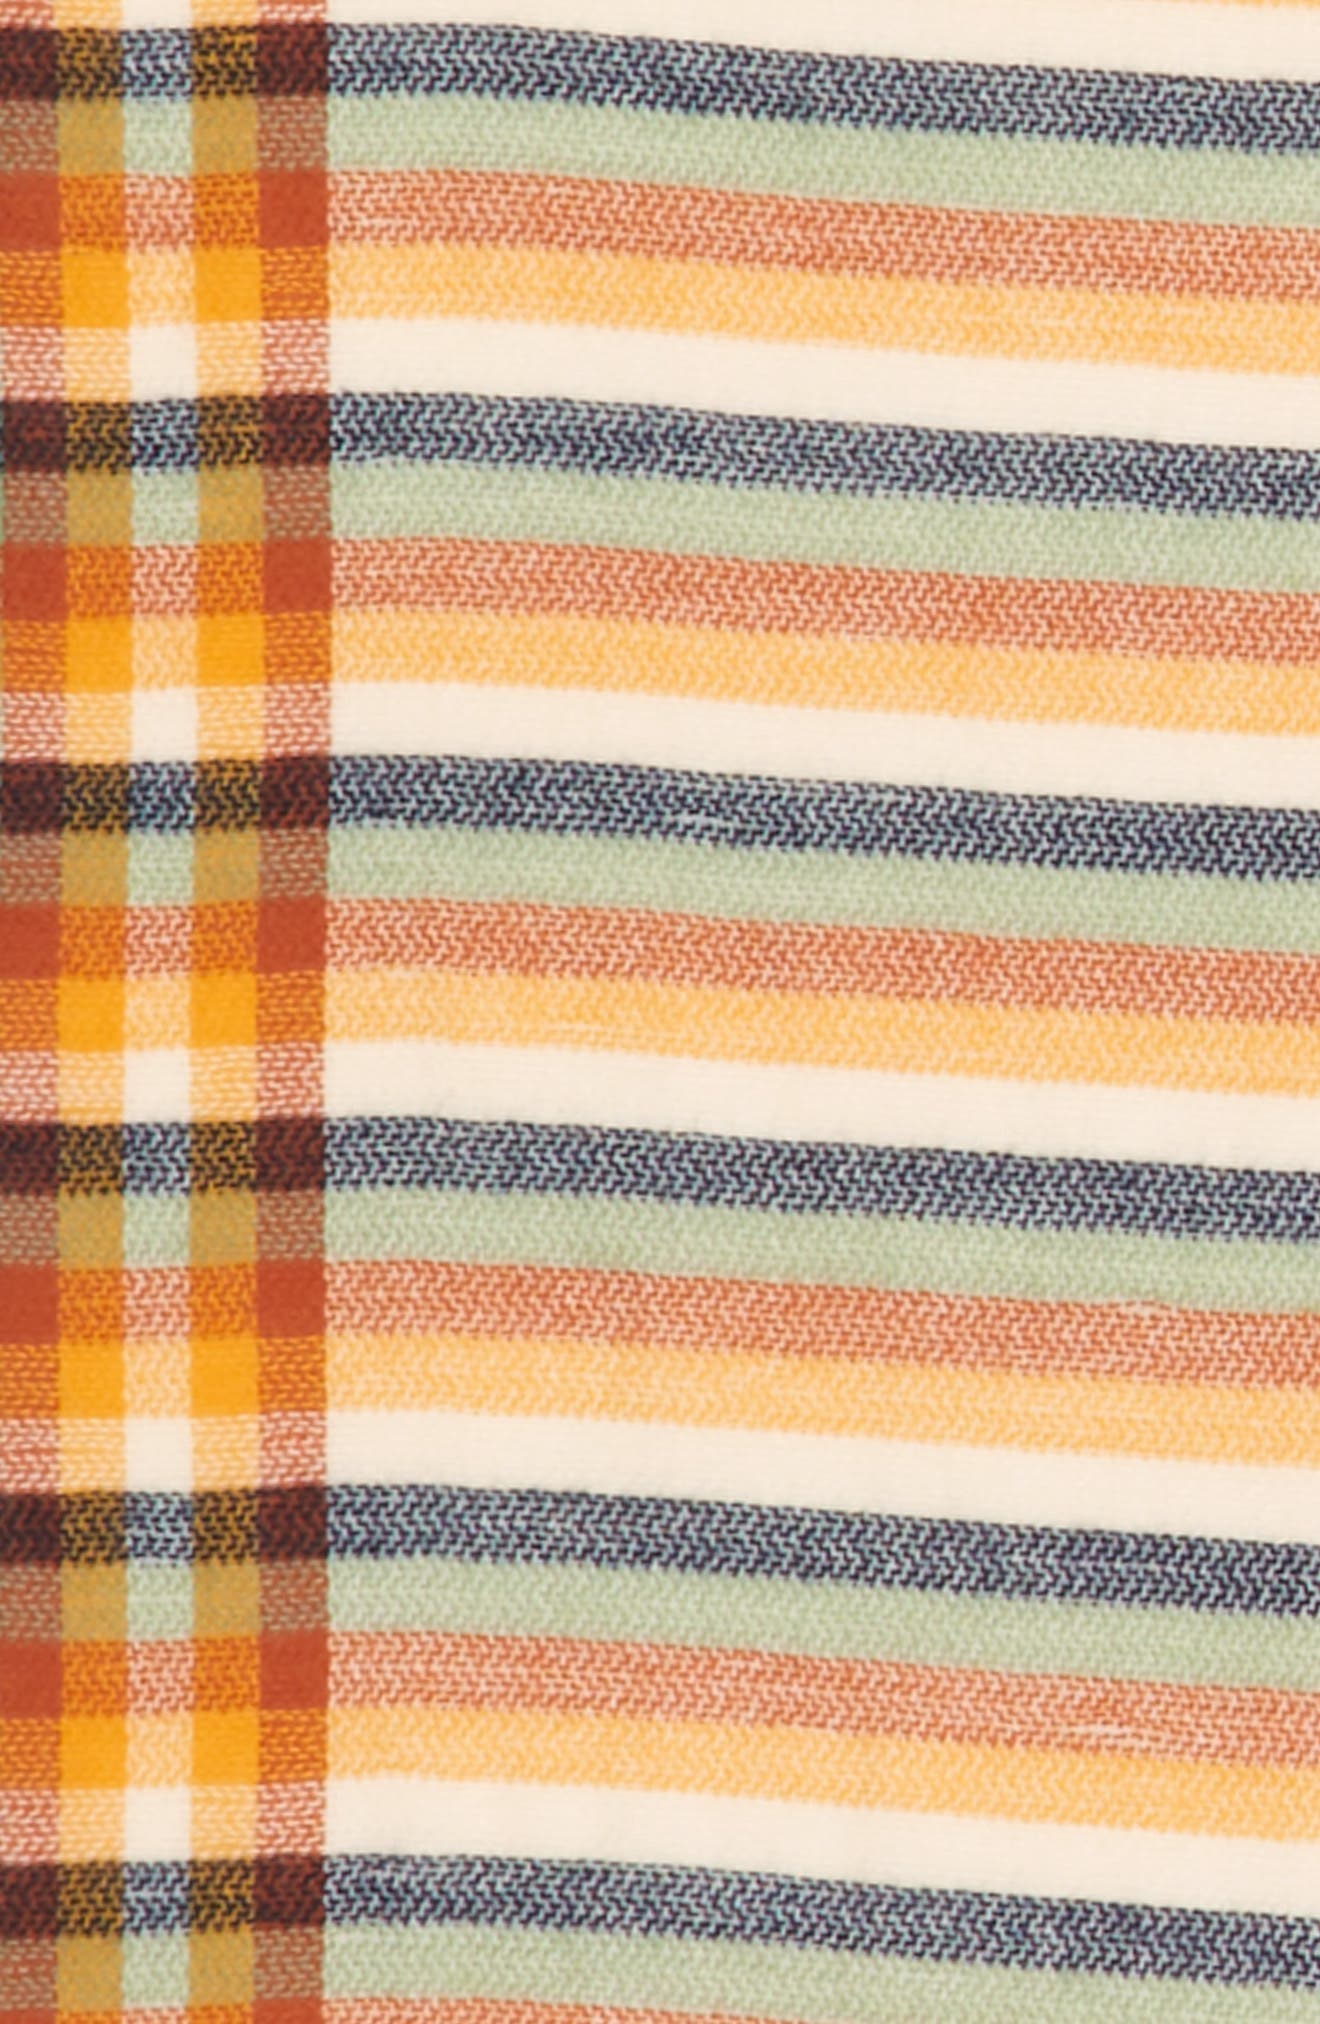 Woven Stripe Scarf,                             Alternate thumbnail 3, color,                             200